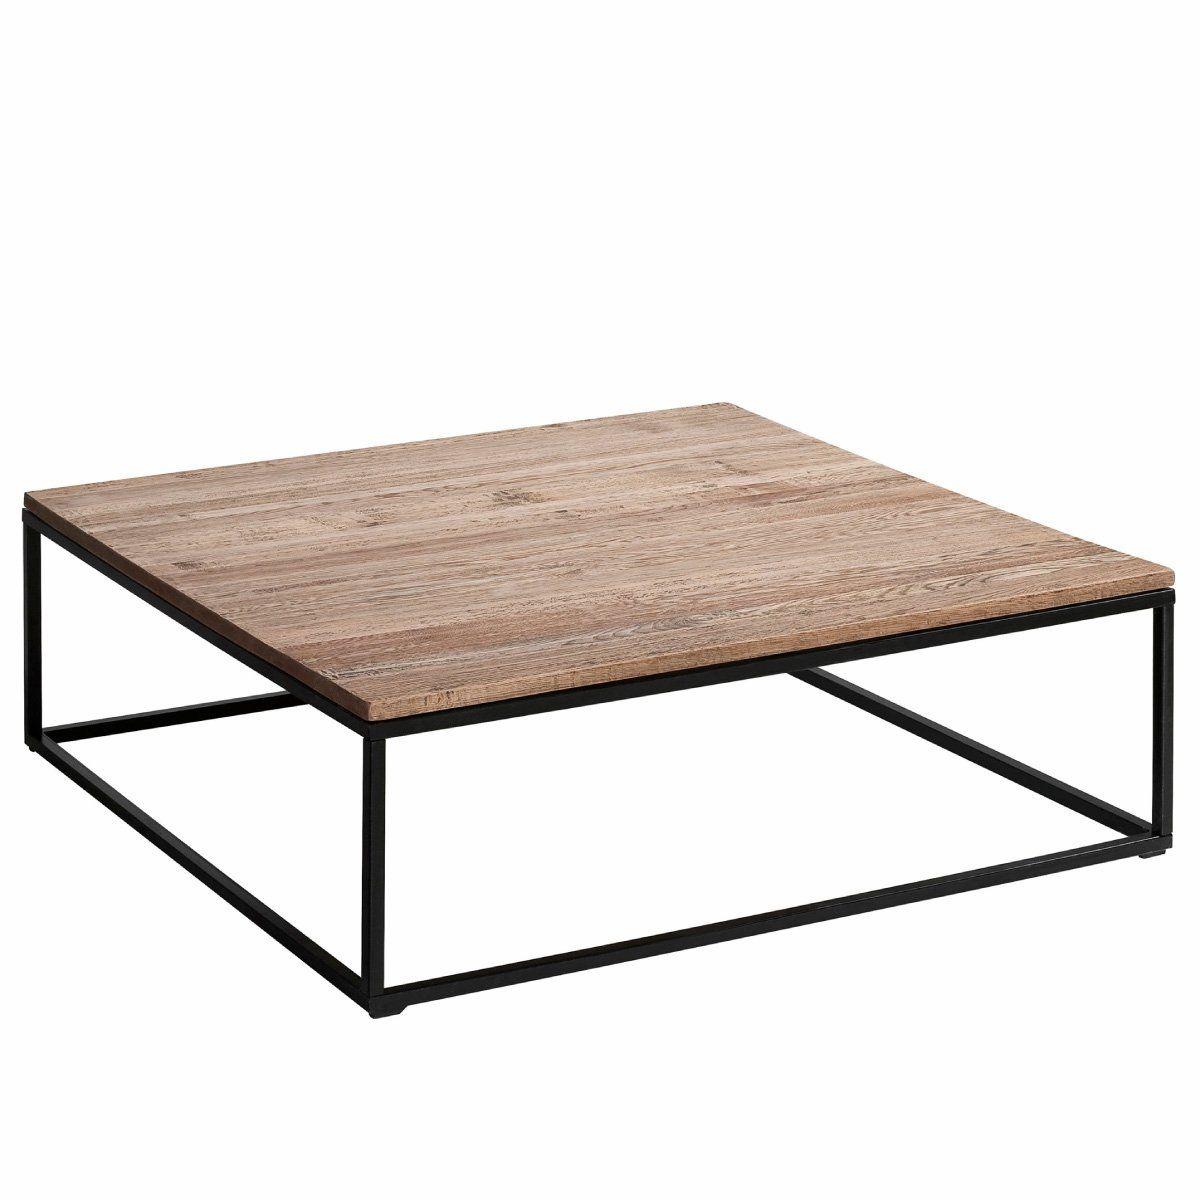 Table Basse Chene Et Metal Aranza 2 Tailles Am Pm La Redoute